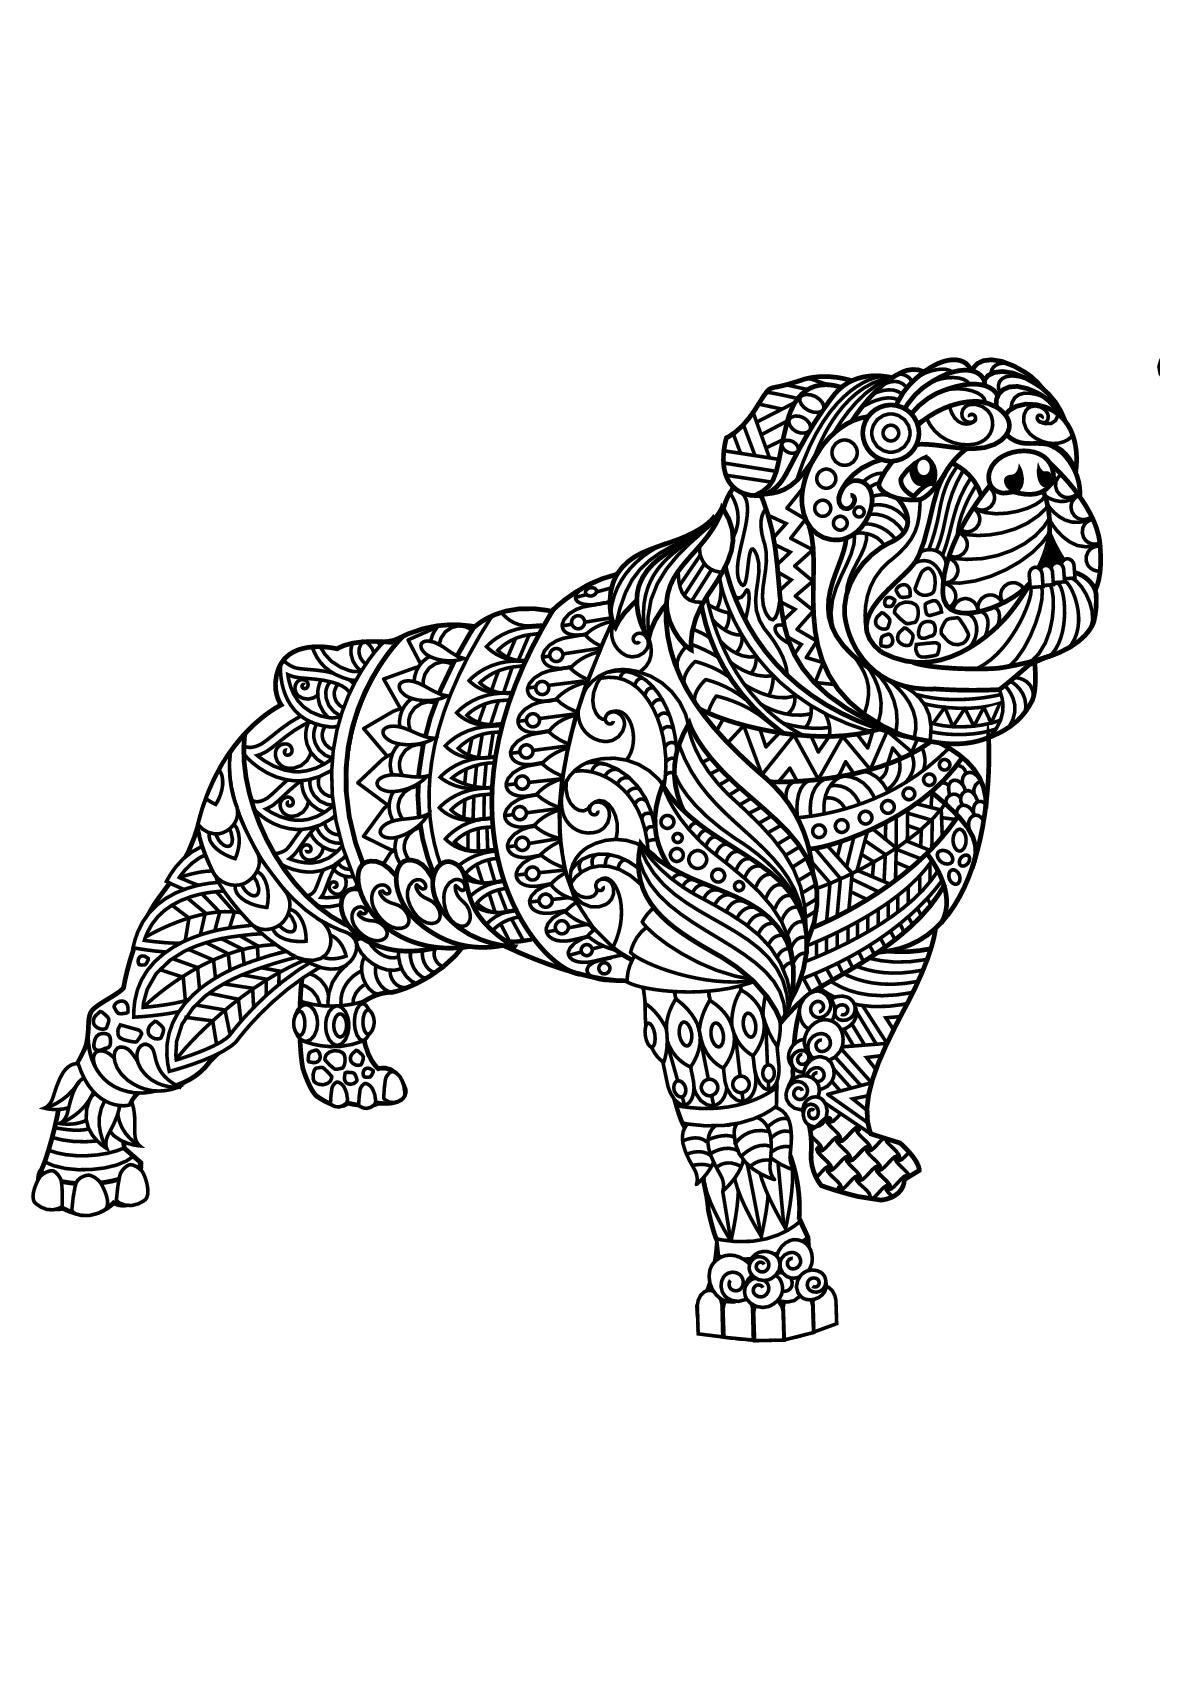 Malbuch Fur Erwachsene  : Hunde - 3